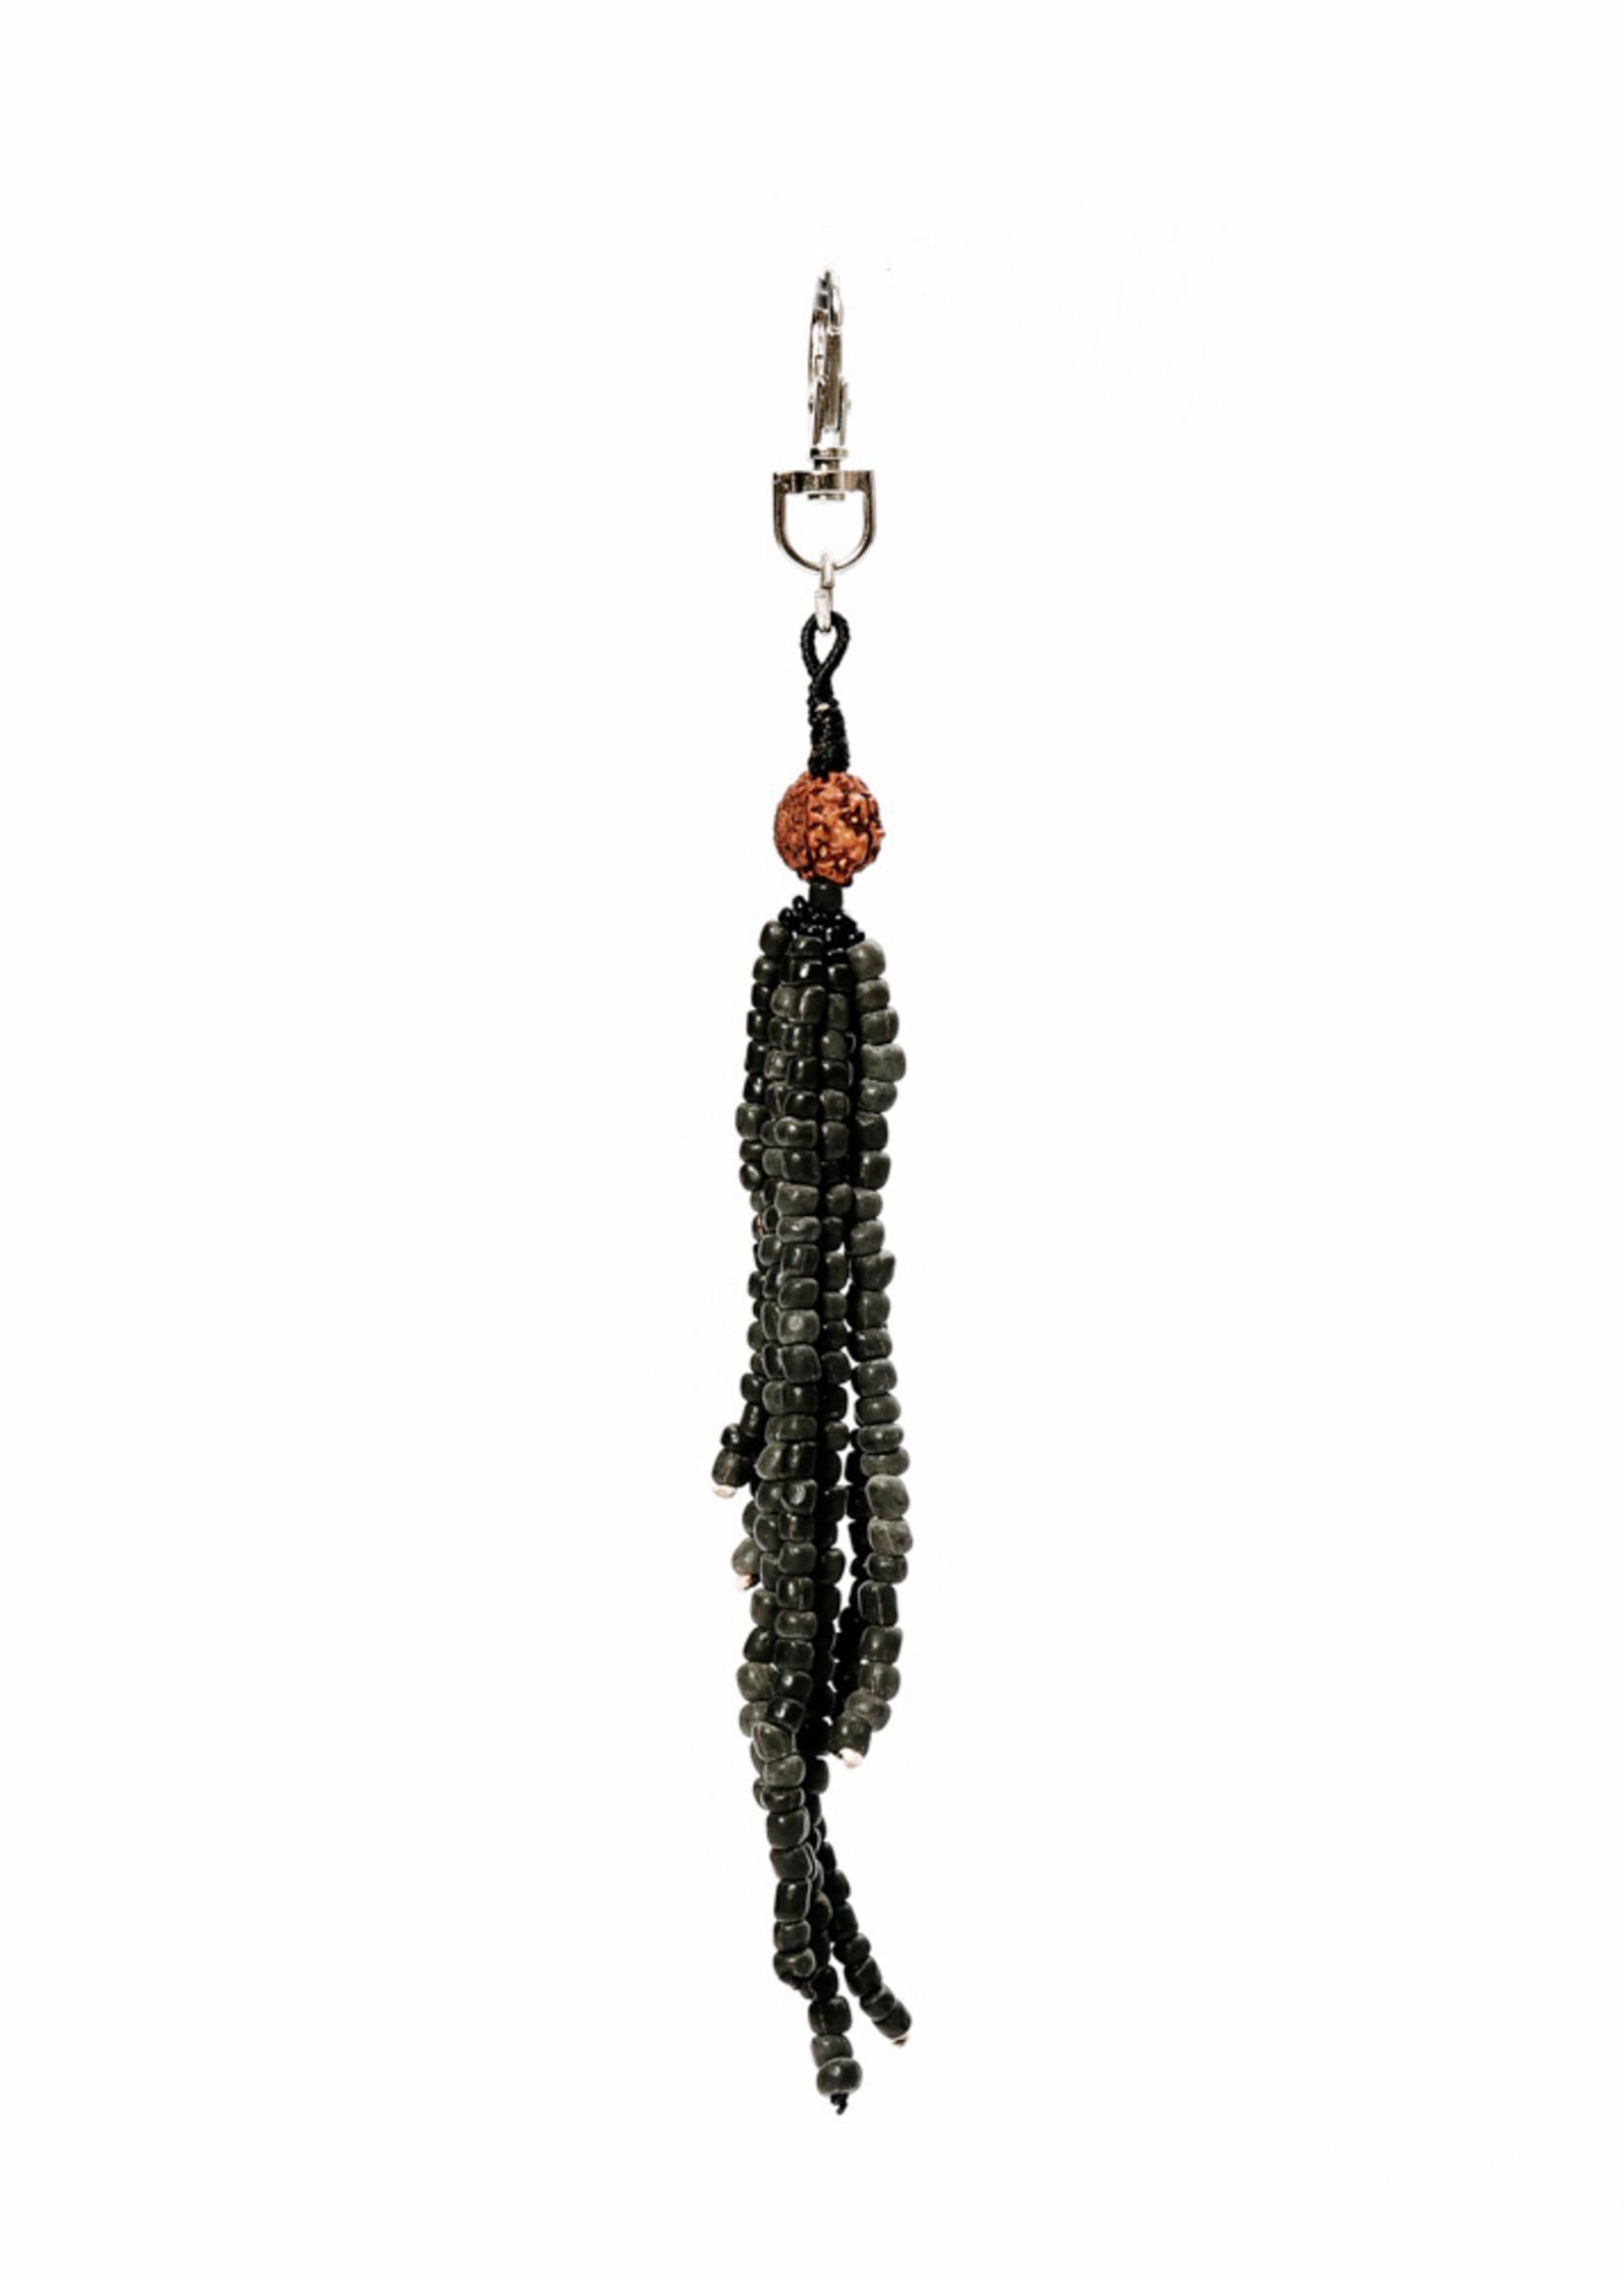 The Lava Stone Keychain